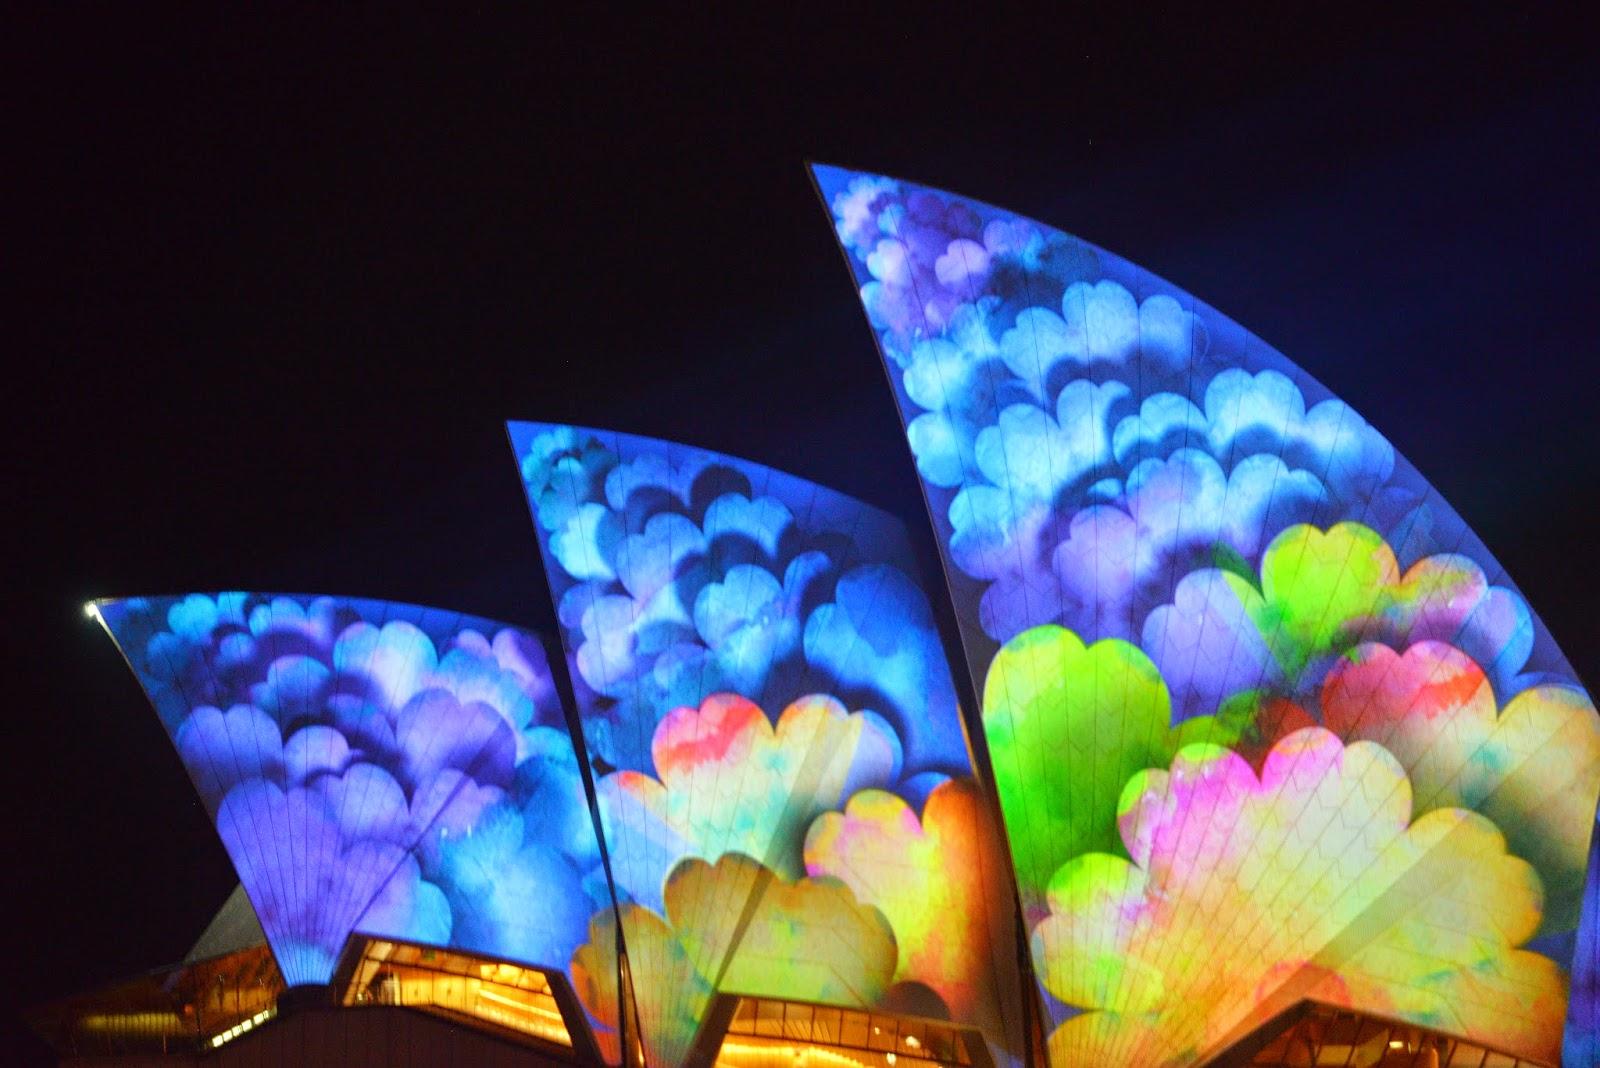 Australia, Culture, Festival of Lights, Lights Festival, News, Offbeat, Sydney Light Show, Sydney Opera House, Vivid Festival, Vivid Festival Photo, Festival,